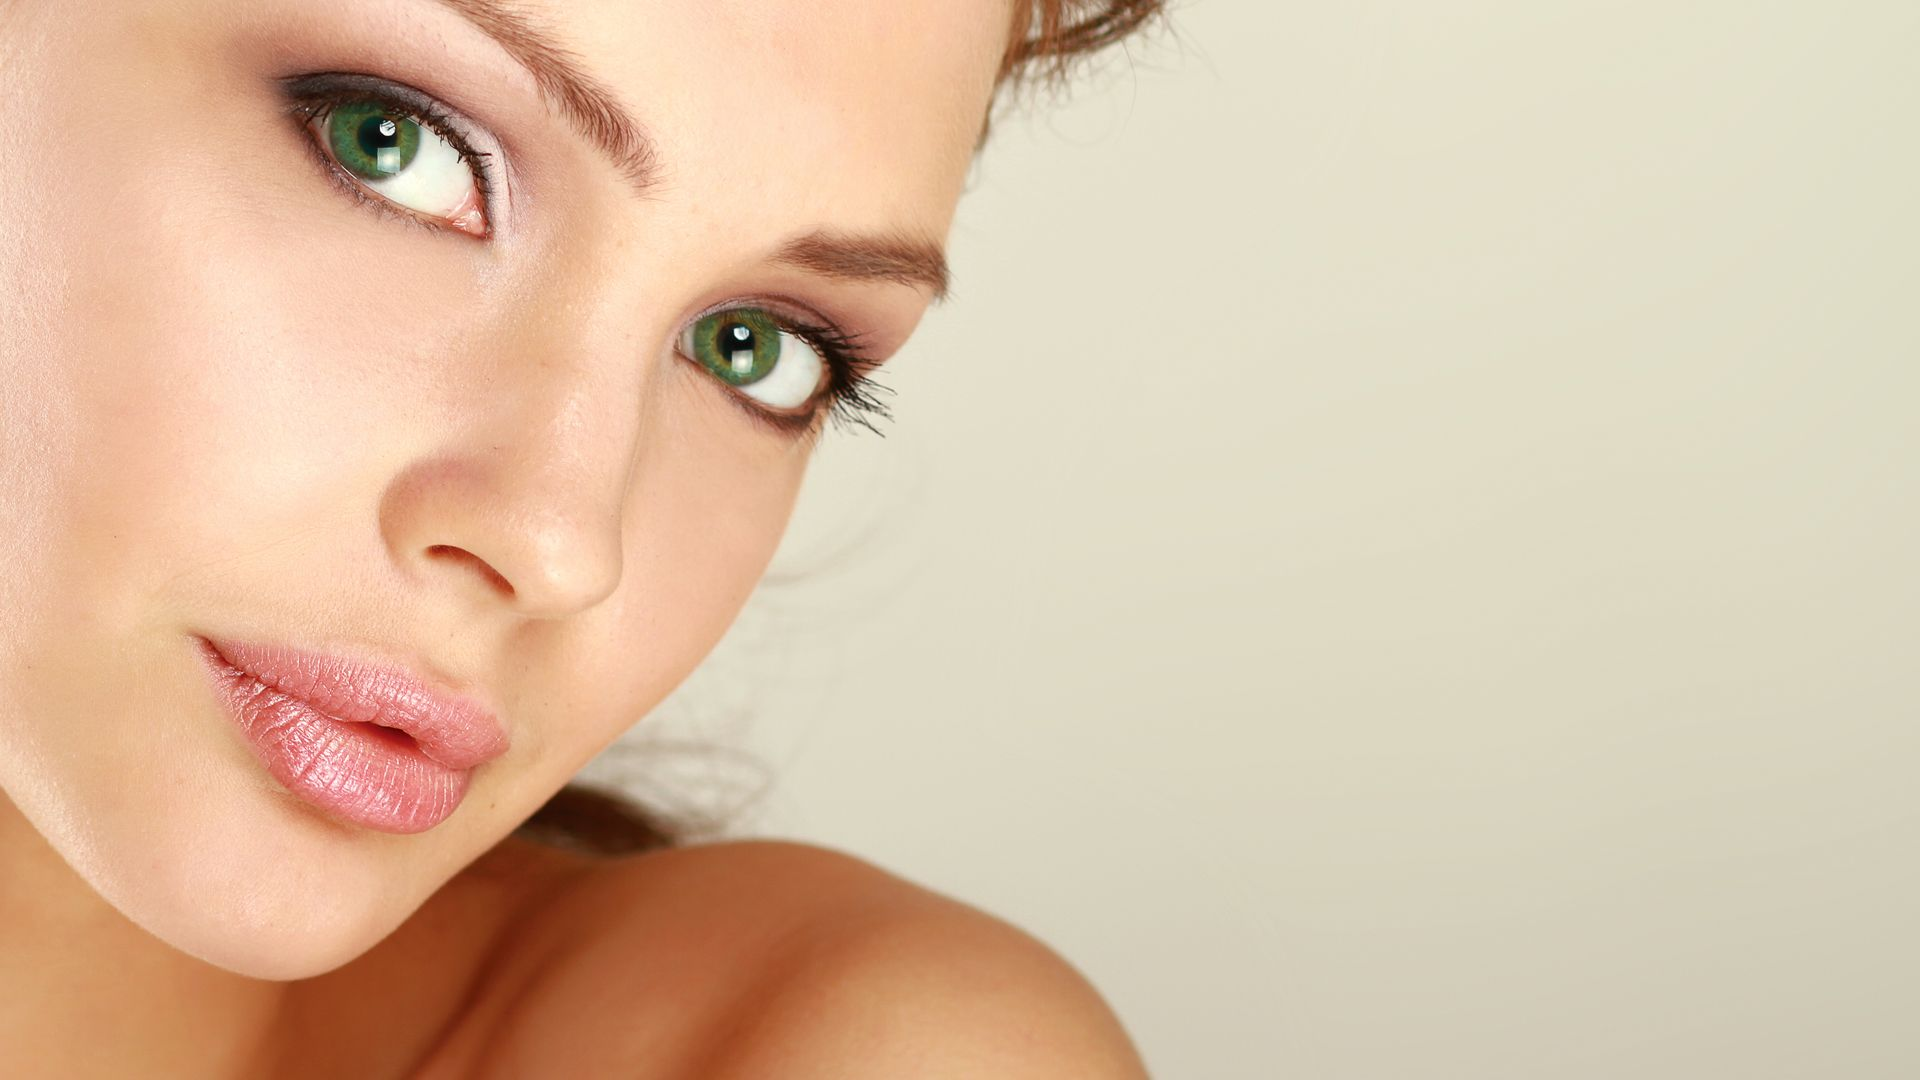 mesoterapia-facial-dr-candau-maxilofacial-cordoba-clinica-bau